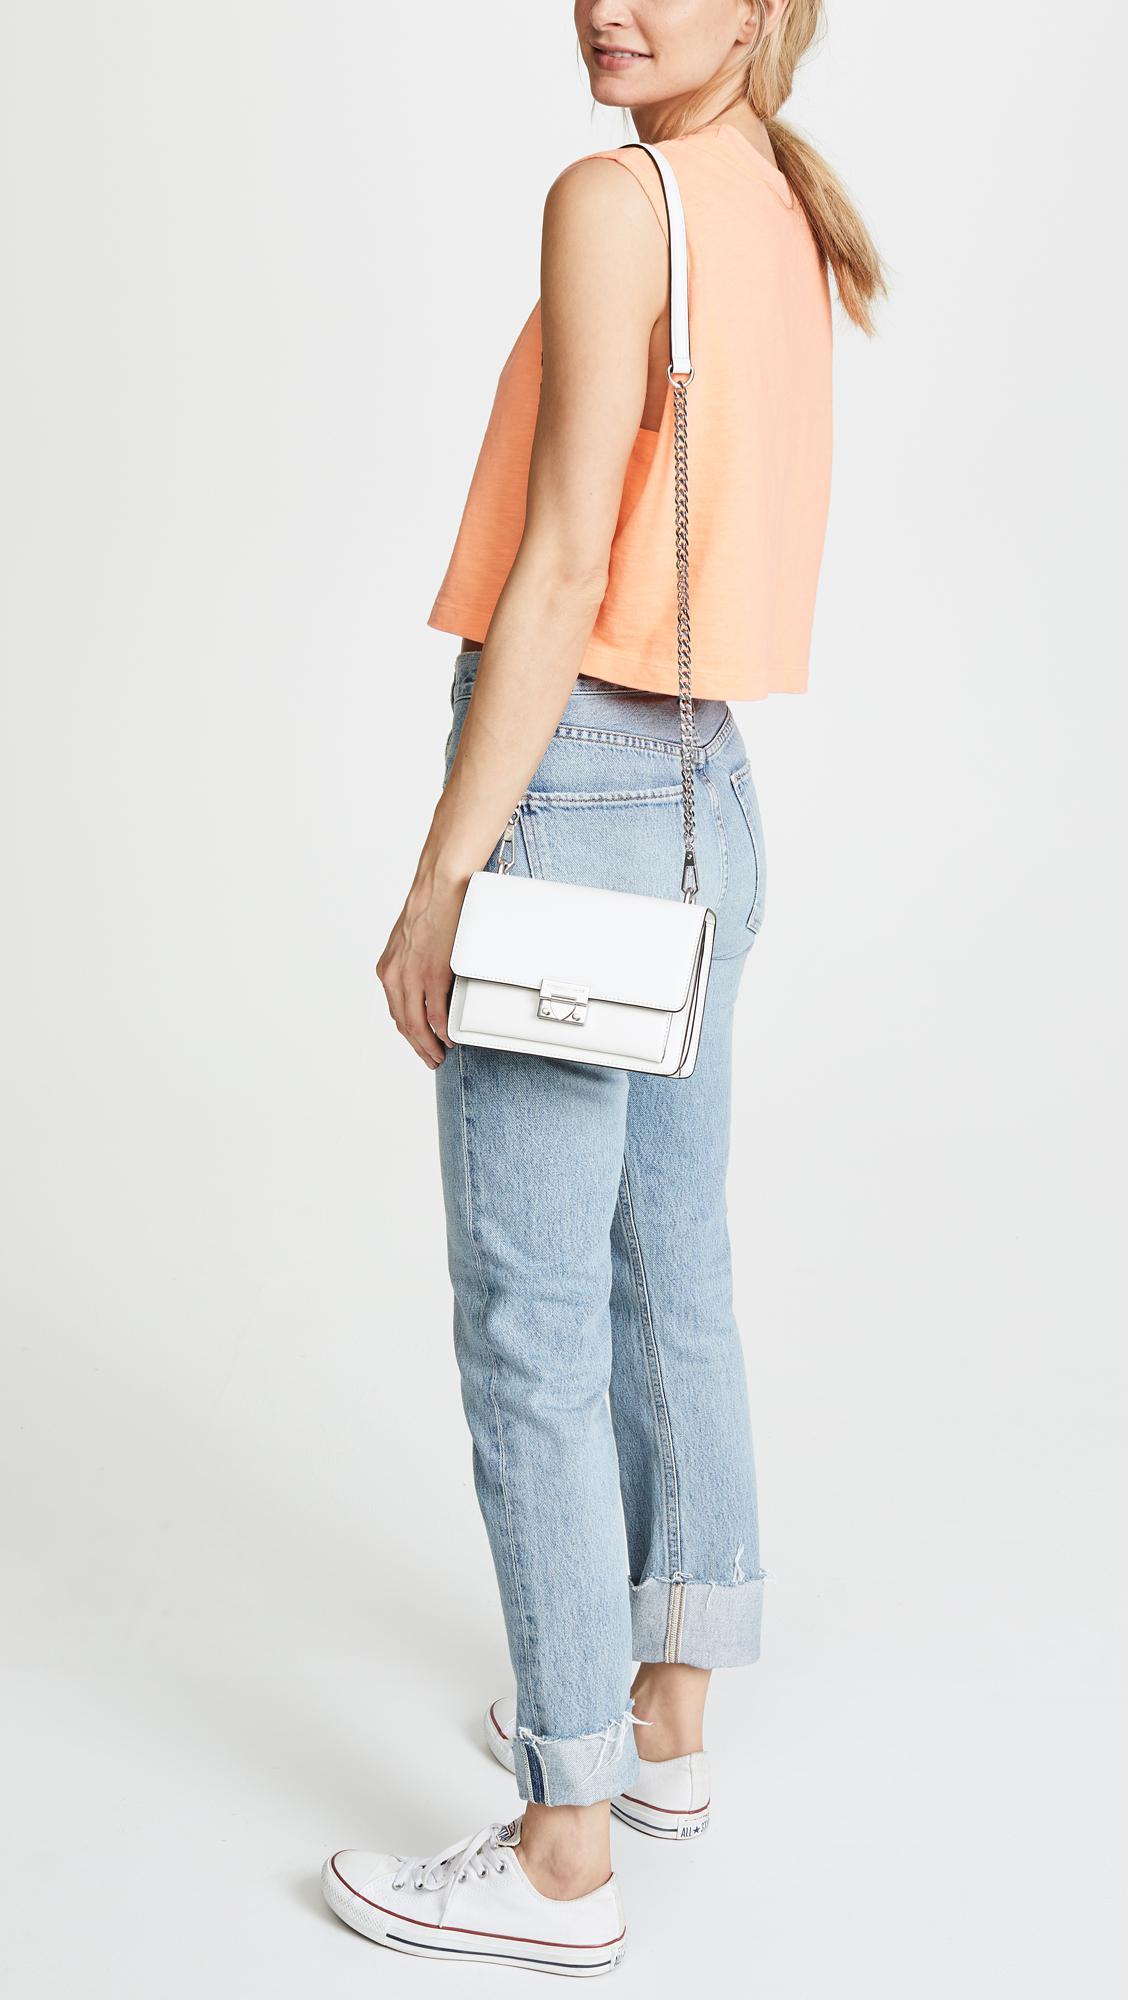 d118c8eb6211 Lyst - Rebecca Minkoff Christy Small Shoulder Bag